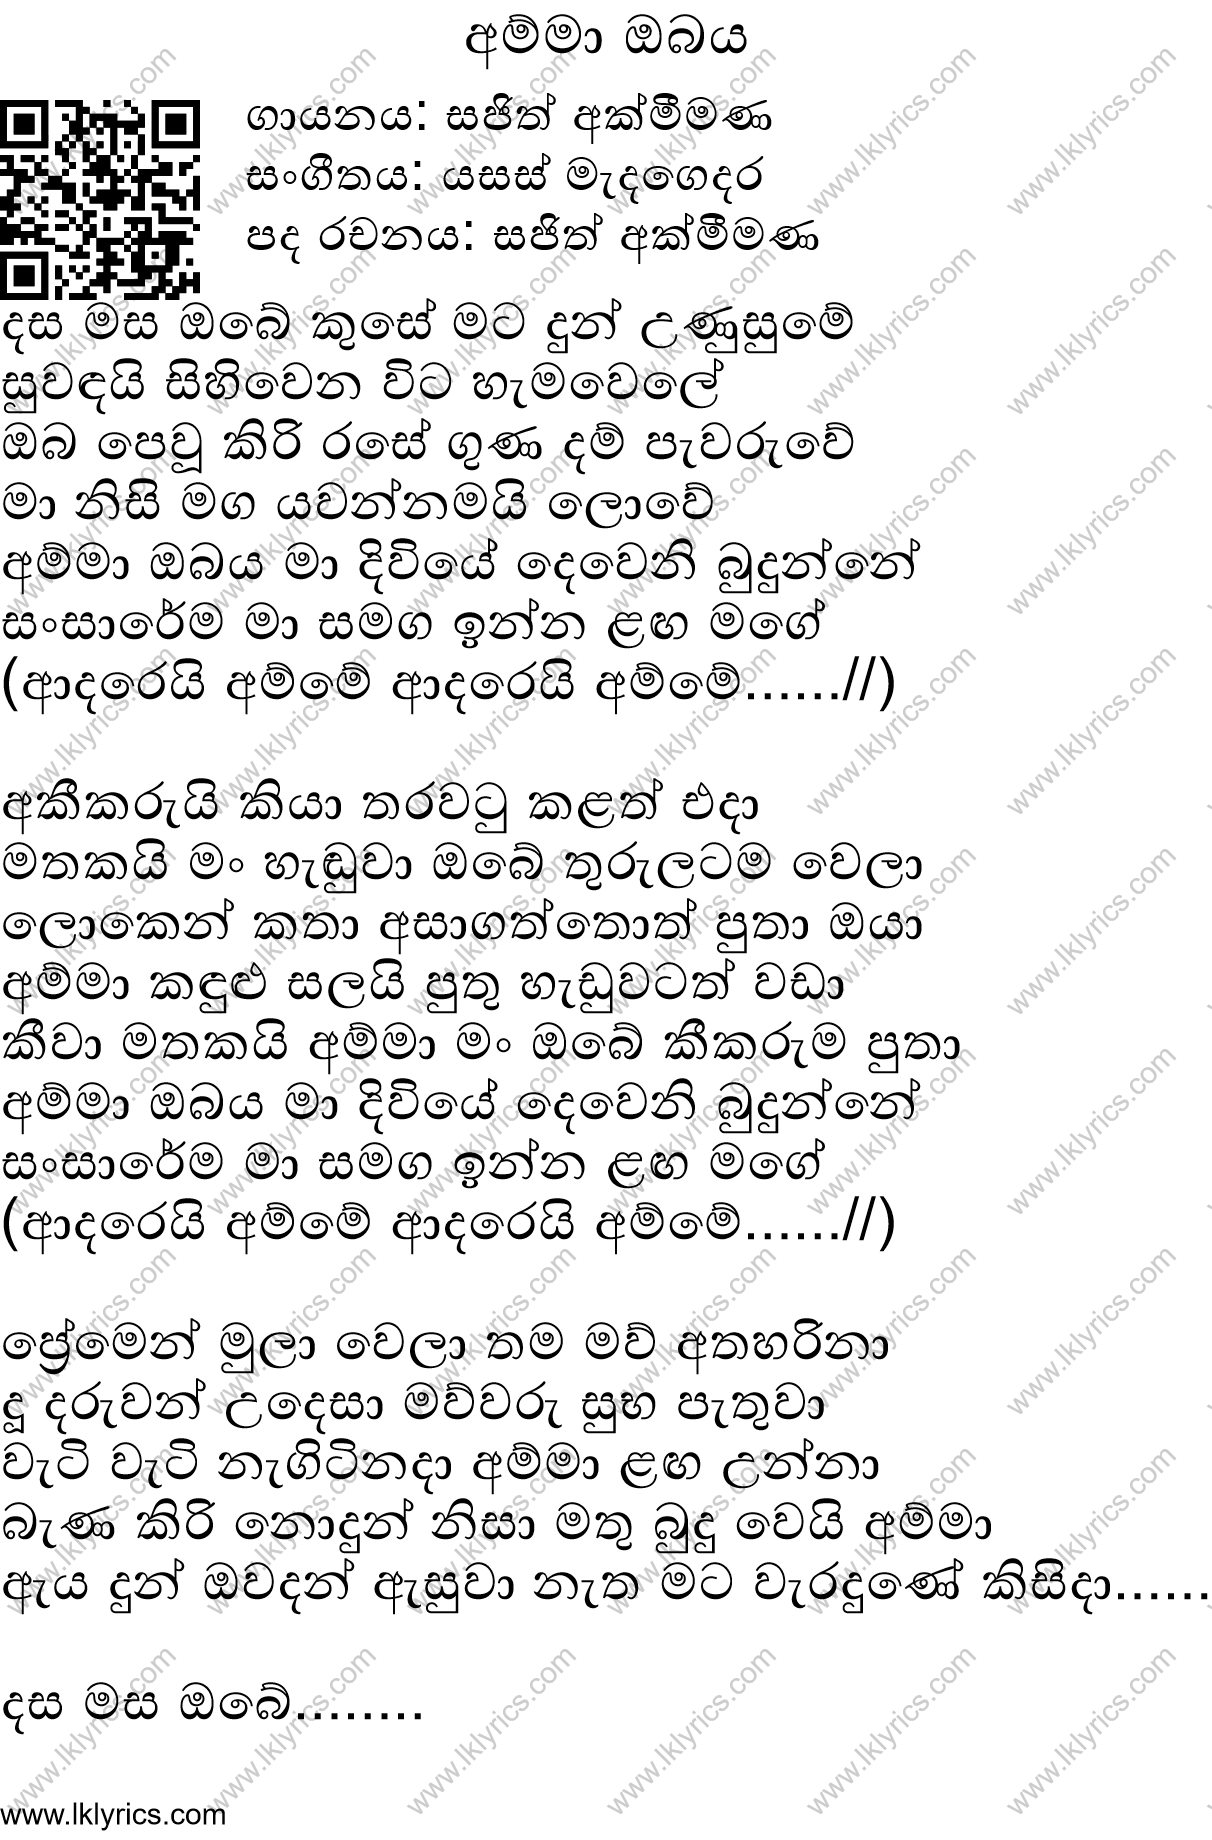 Amma Amma Song Lyrics - tamil2lyrics.com